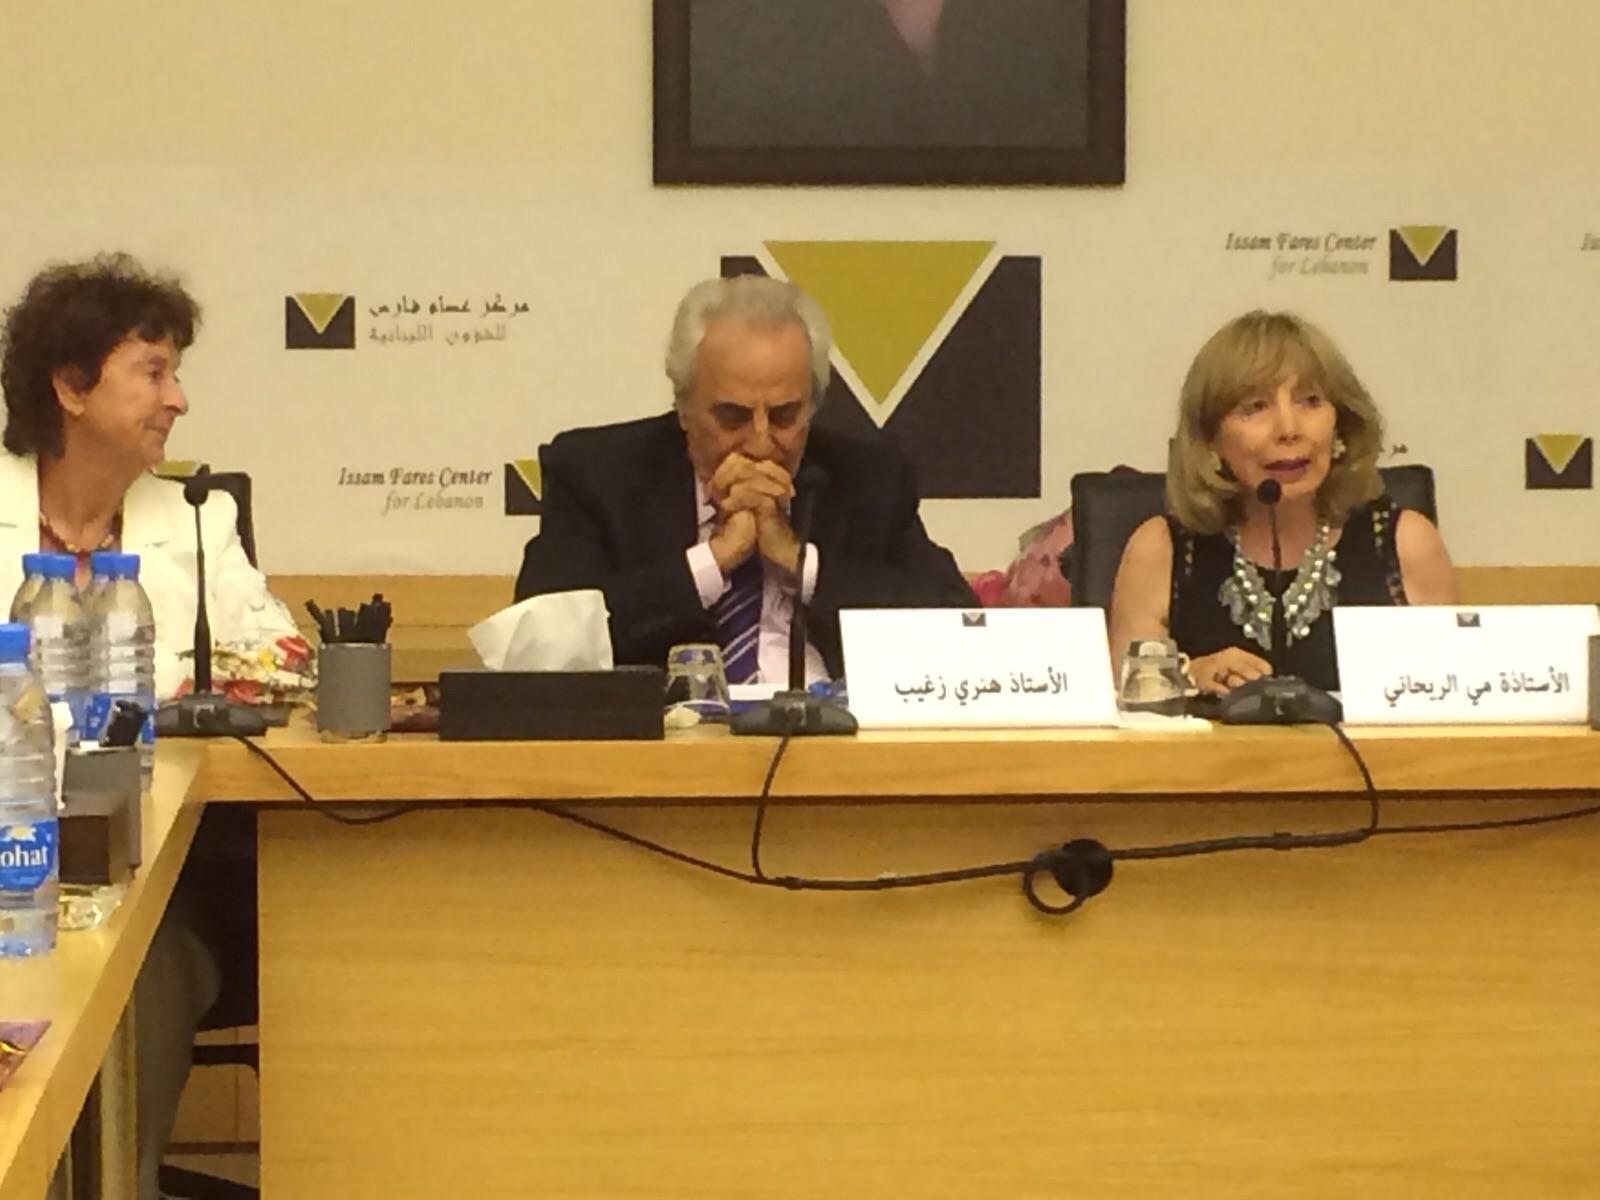 May Menassa and Henri Zghaib discussing May's book